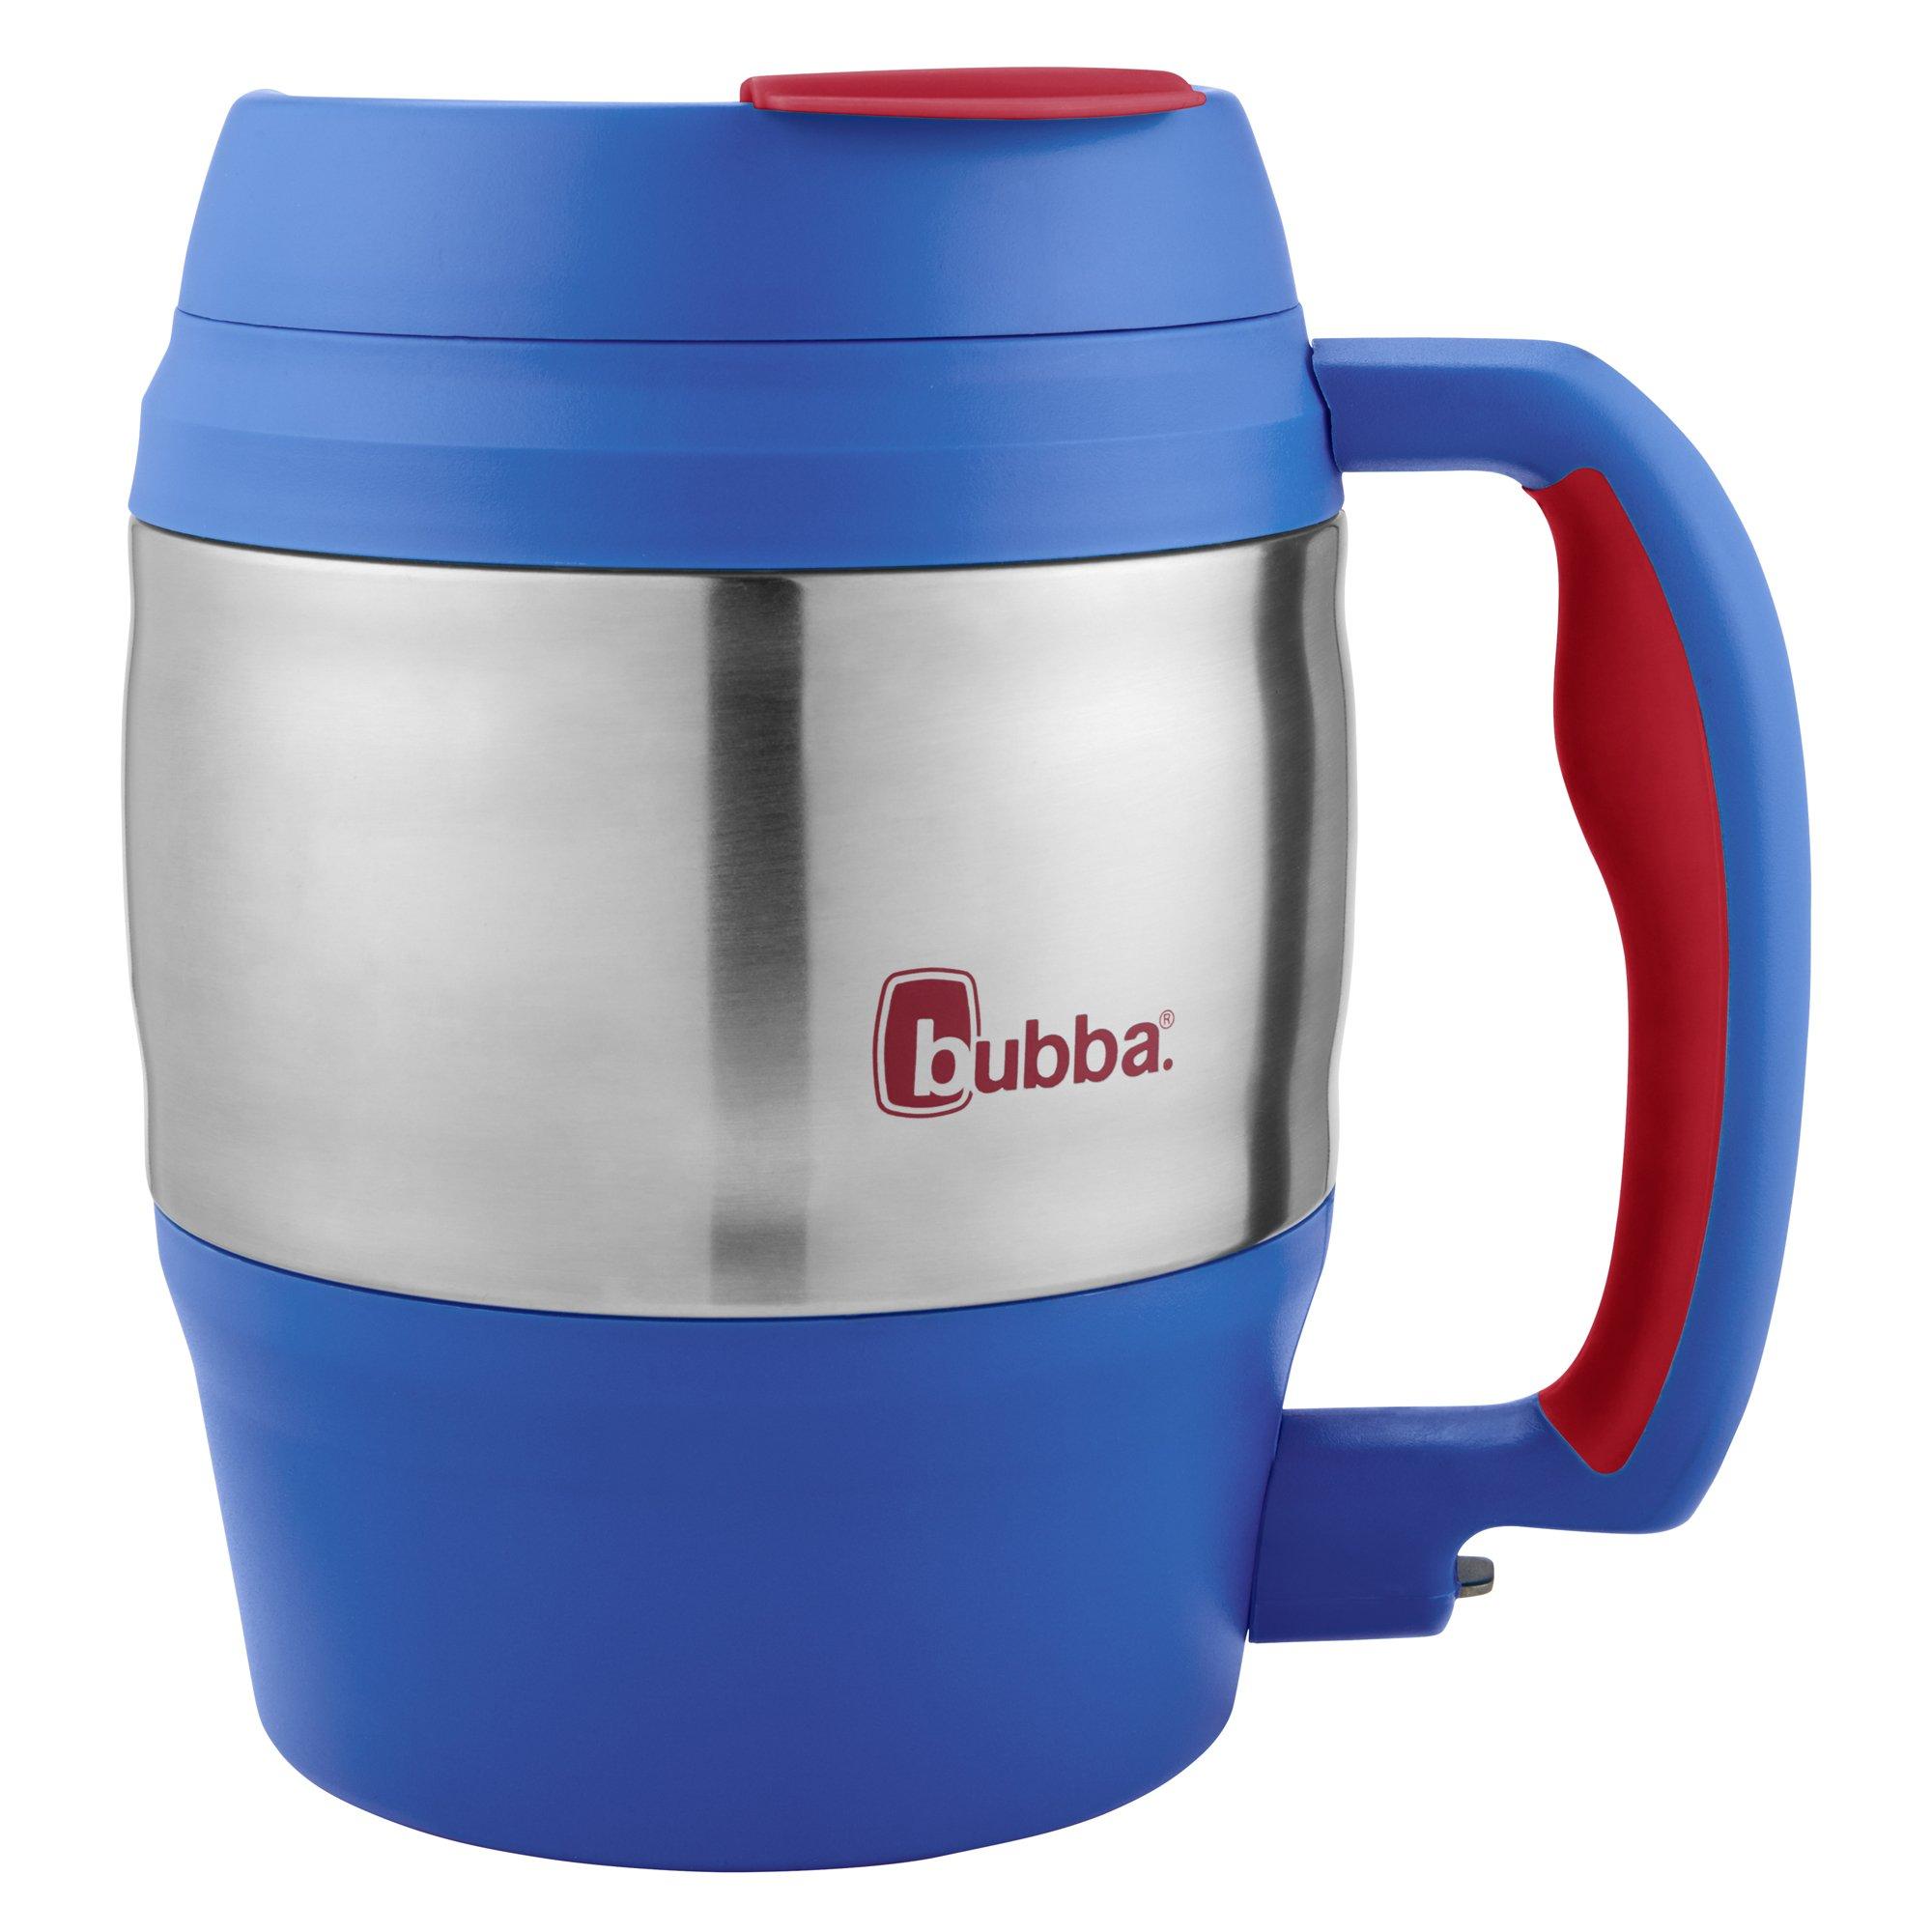 bubba 2035632 Desk Mug, 52 oz, Vineyard